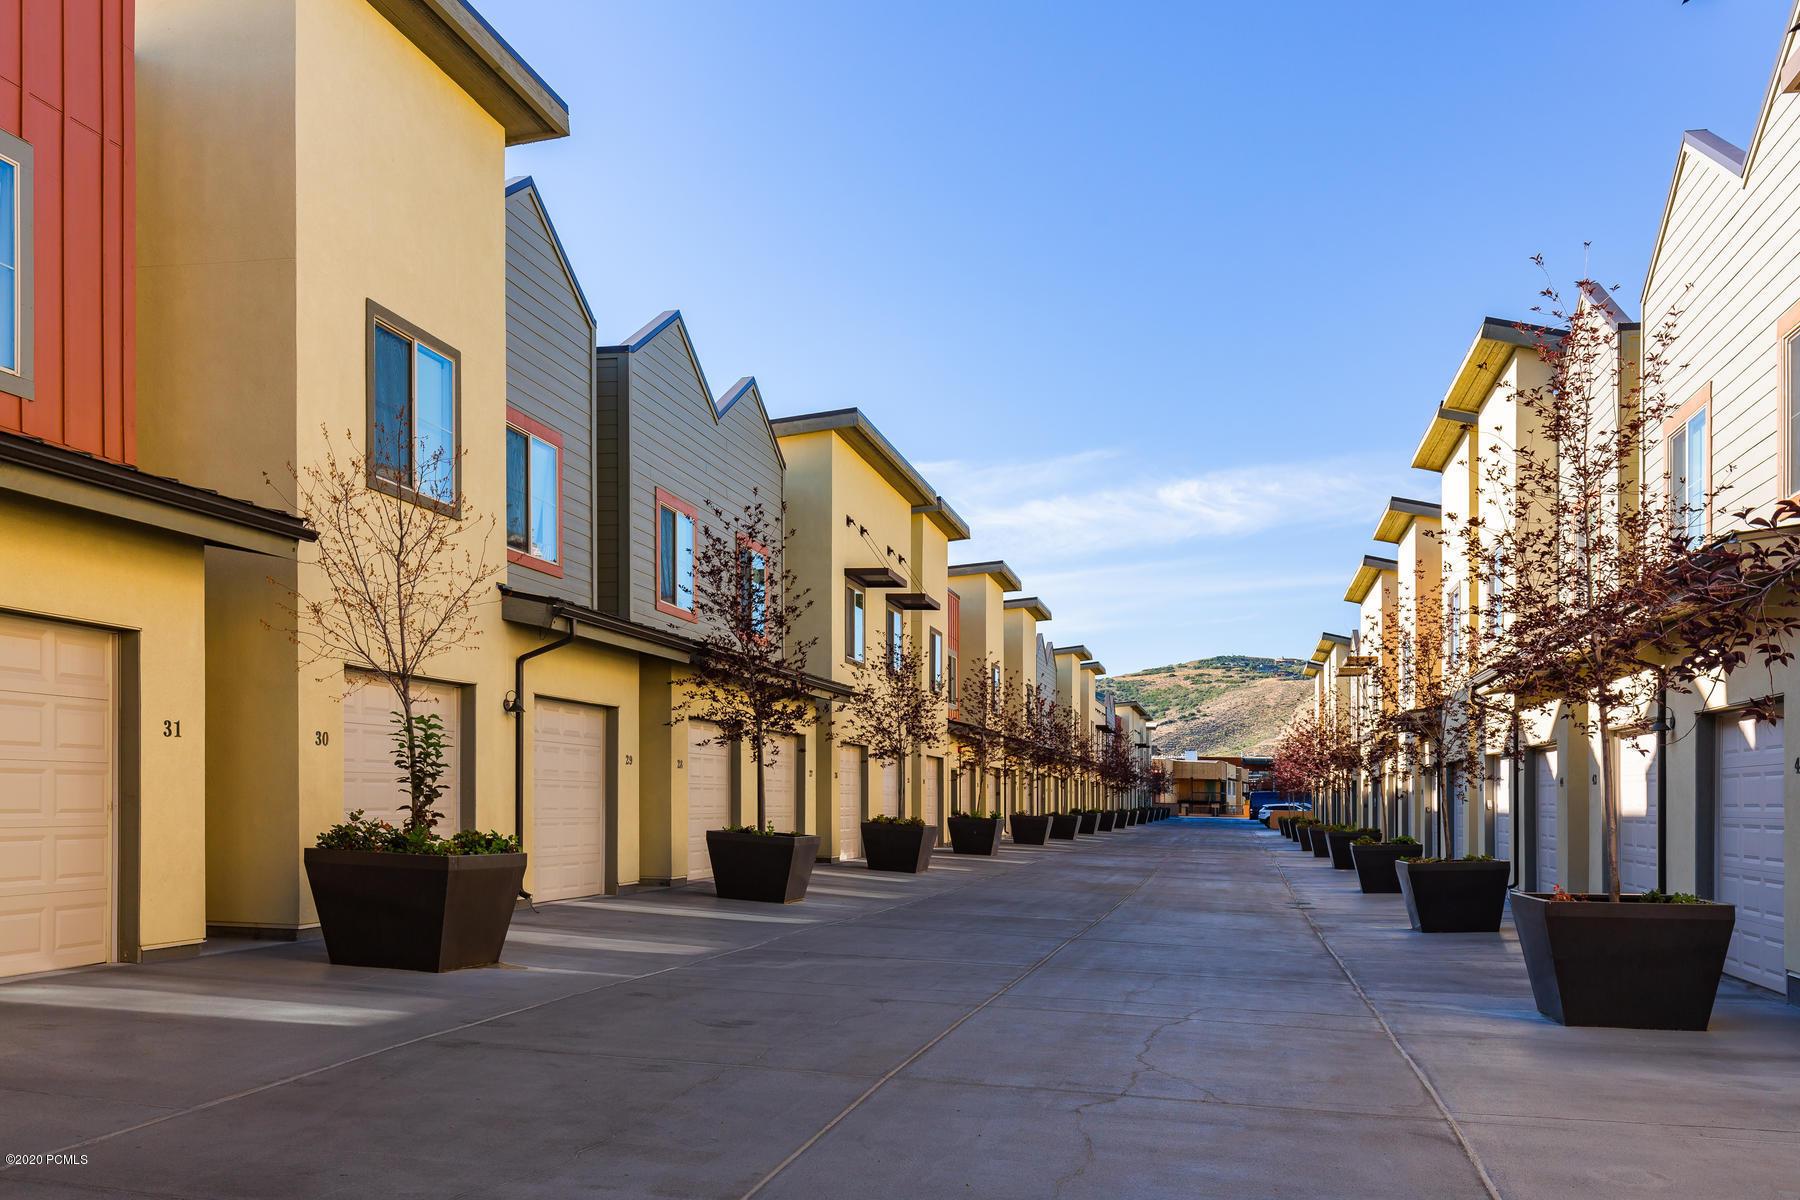 6169 Park Lane South, Park City, Utah 84098, 2 Bedrooms Bedrooms, ,2 BathroomsBathrooms,Condominium,For Sale,Park Lane,12002714